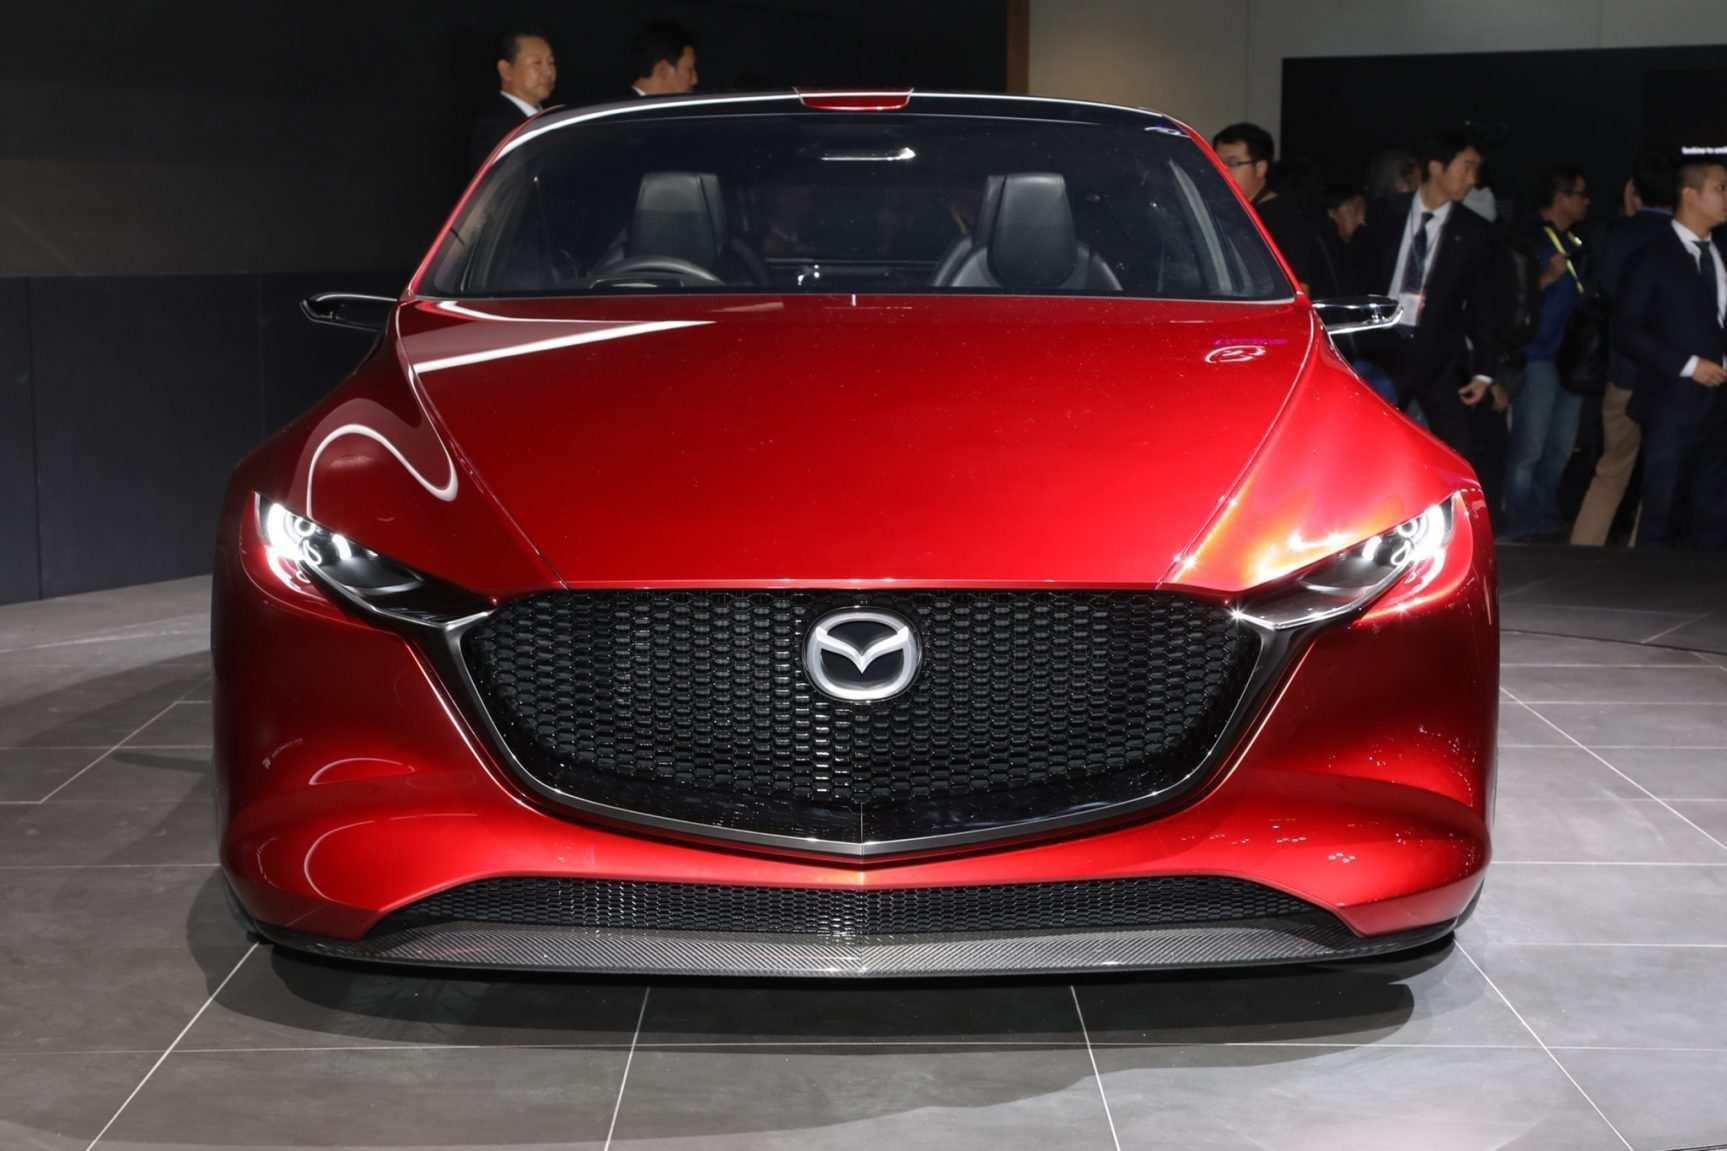 63 Gallery of Mazda Kai 2019 Pricing for Mazda Kai 2019